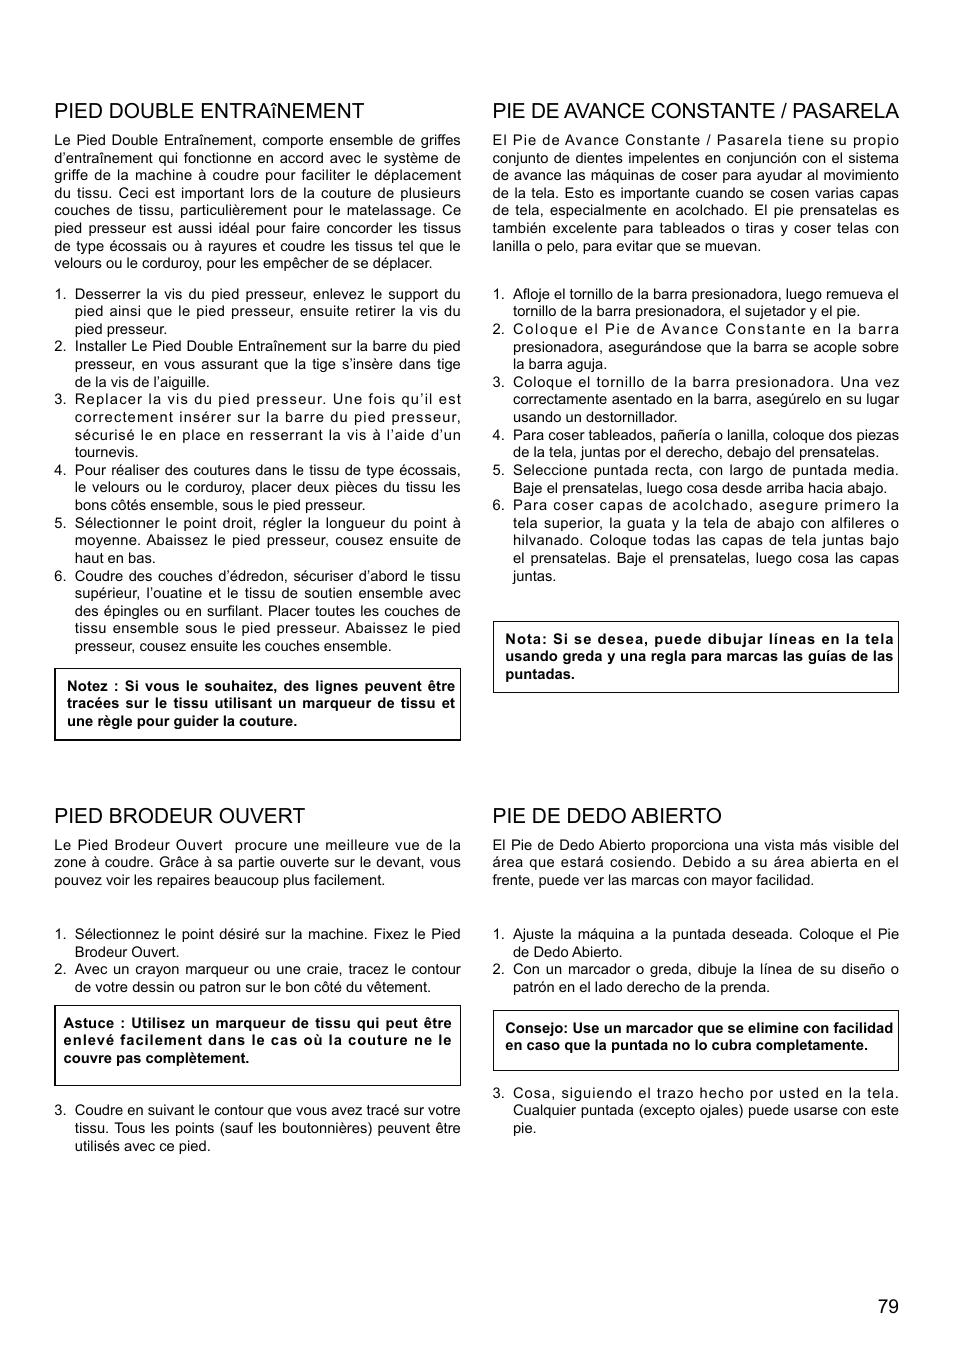 Avance User Manual Tempstar Condenser Wiring Diagram Hecho Array Pied Double Entra Nement Pie De Constante Pasarela Rh Manualsdir Com